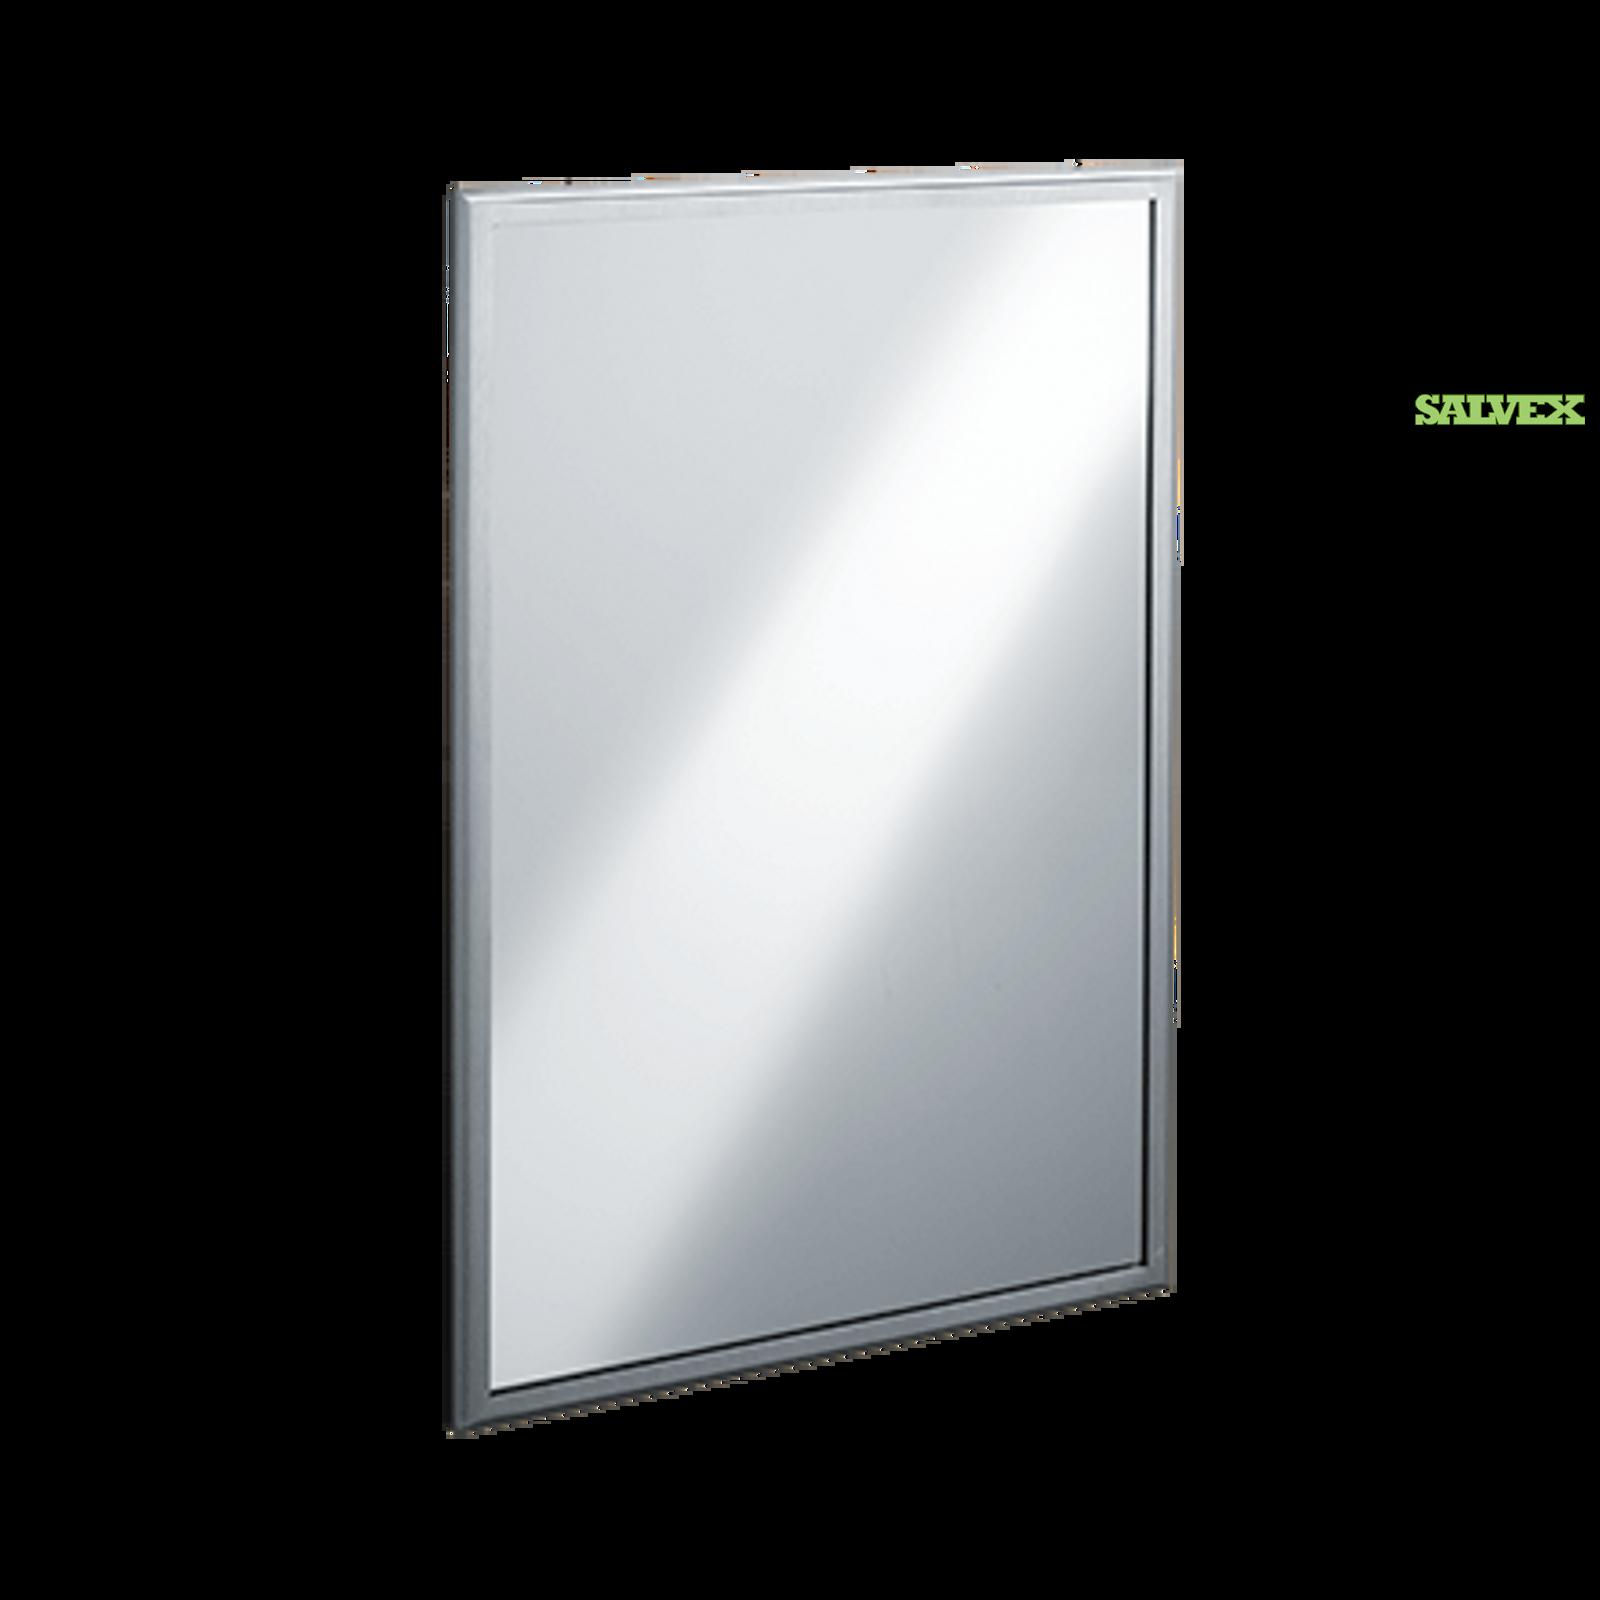 Roval Temp Mirrors 24x30 (34 Units)